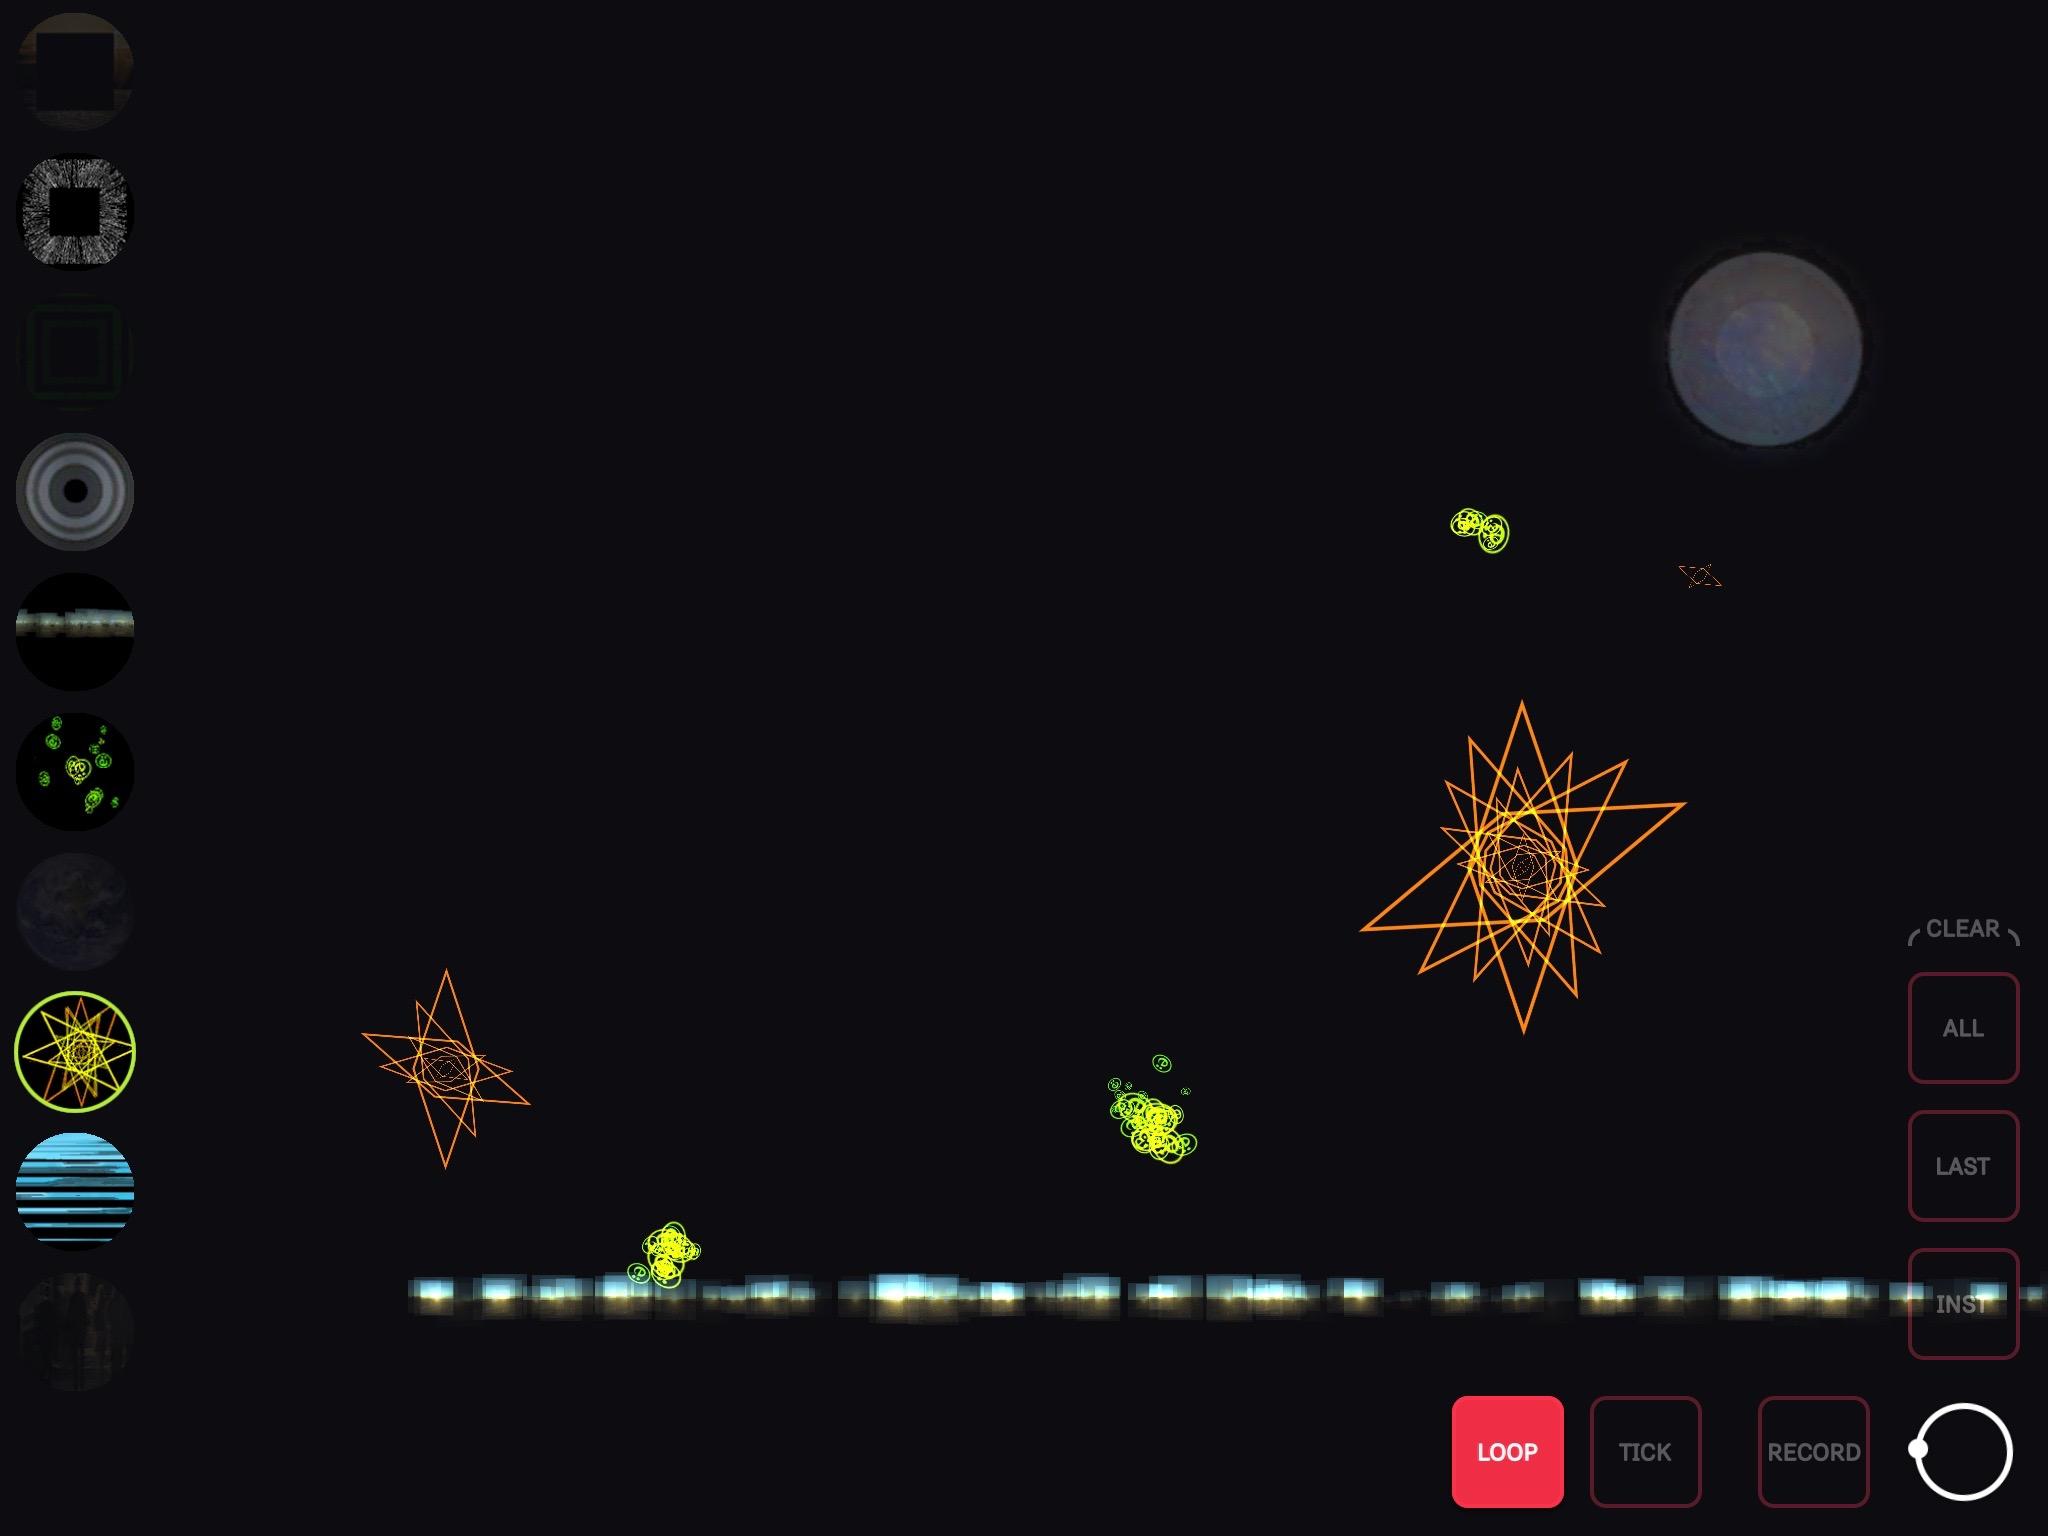 ORO Screenshot 10.png